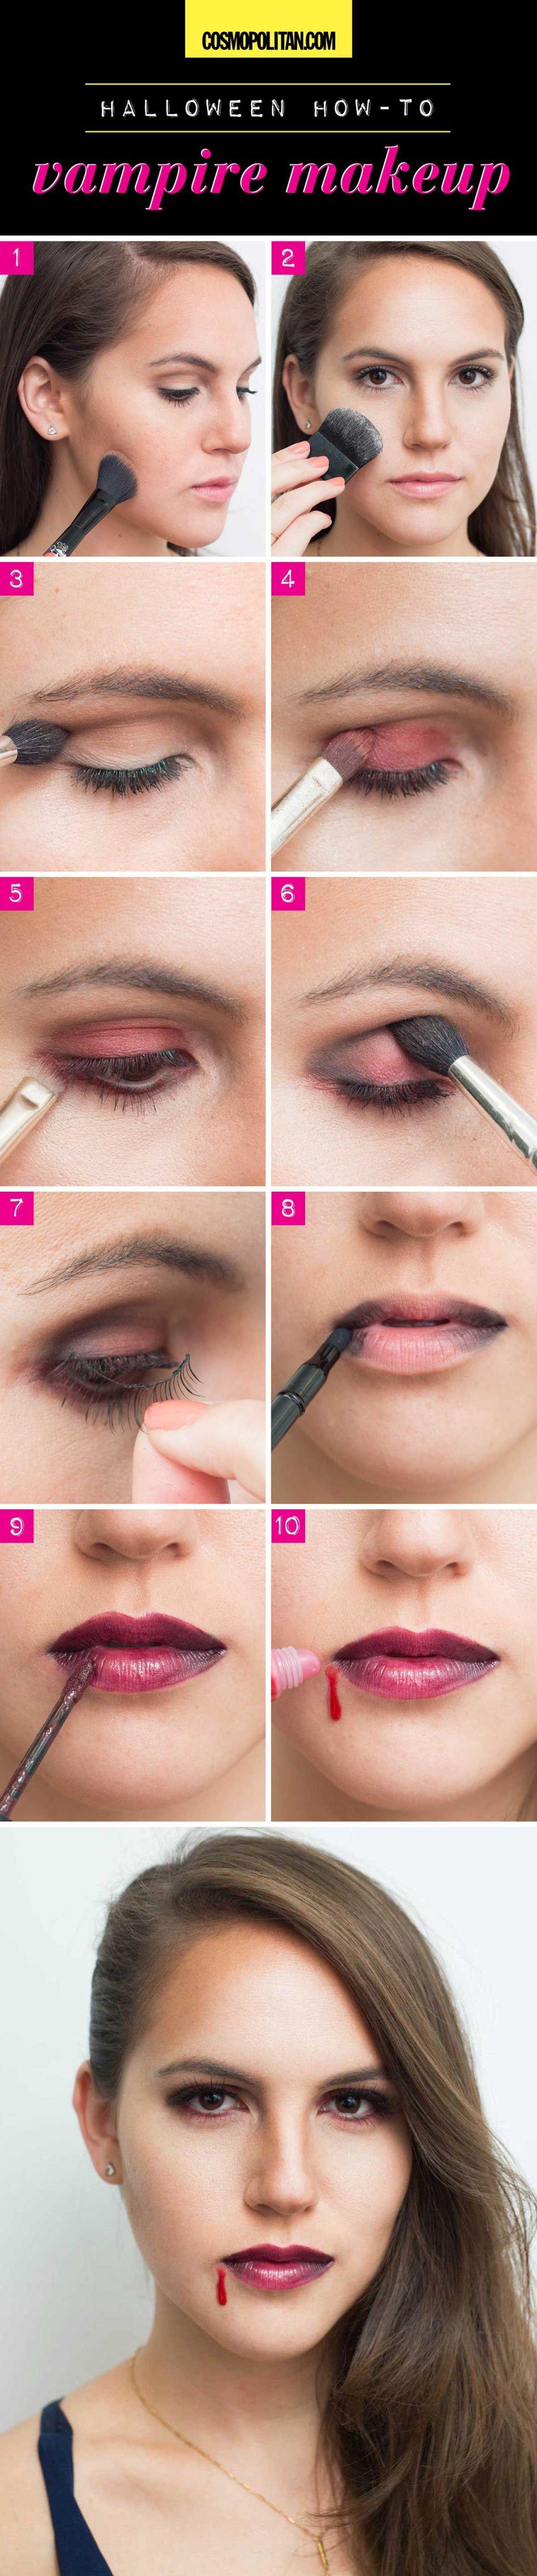 8 easy halloween makeup ideas halloween makeup tutorials with makeup you already have